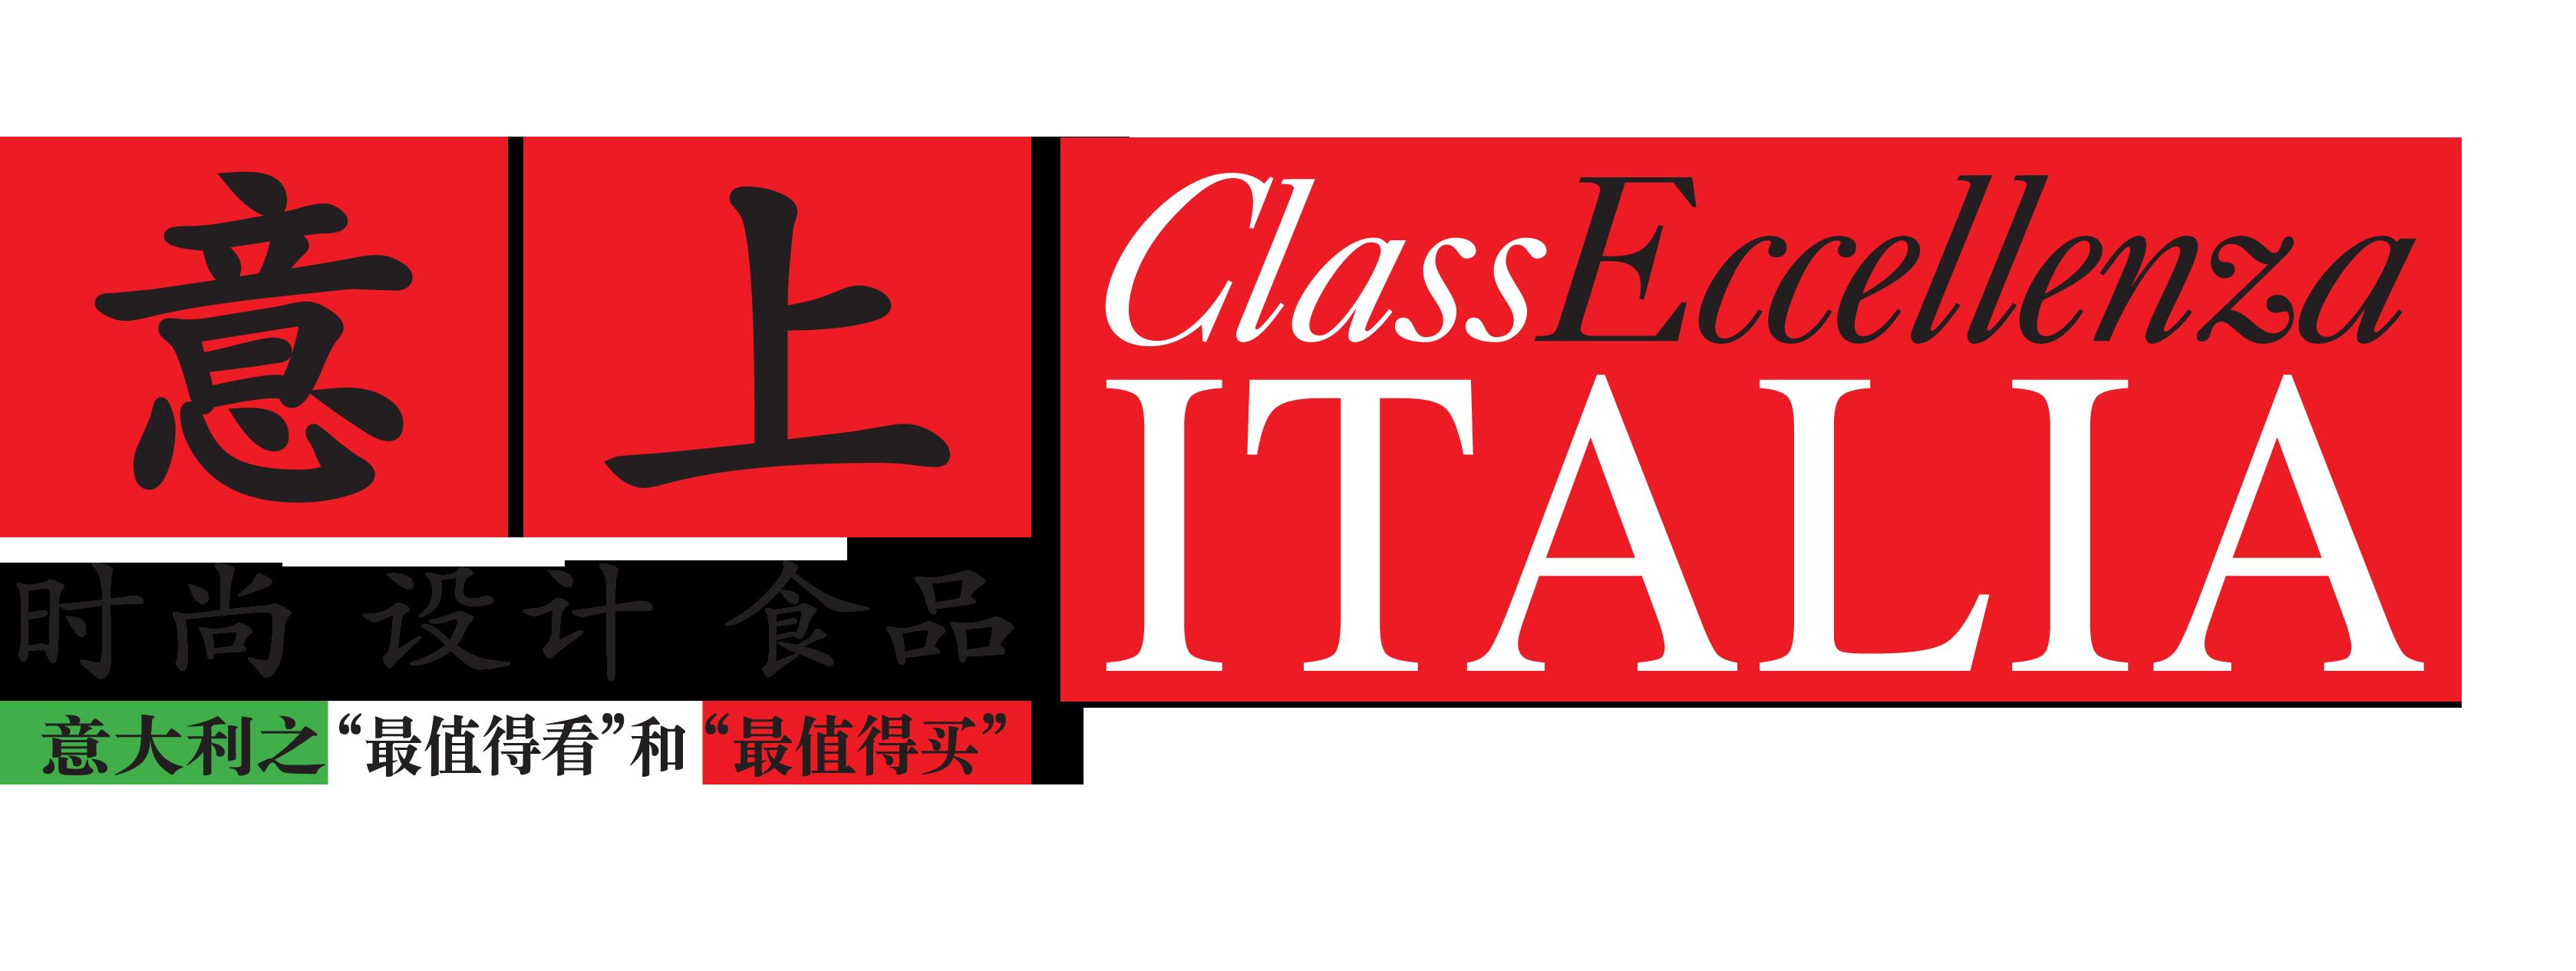 意上Class Eccellenza Italia